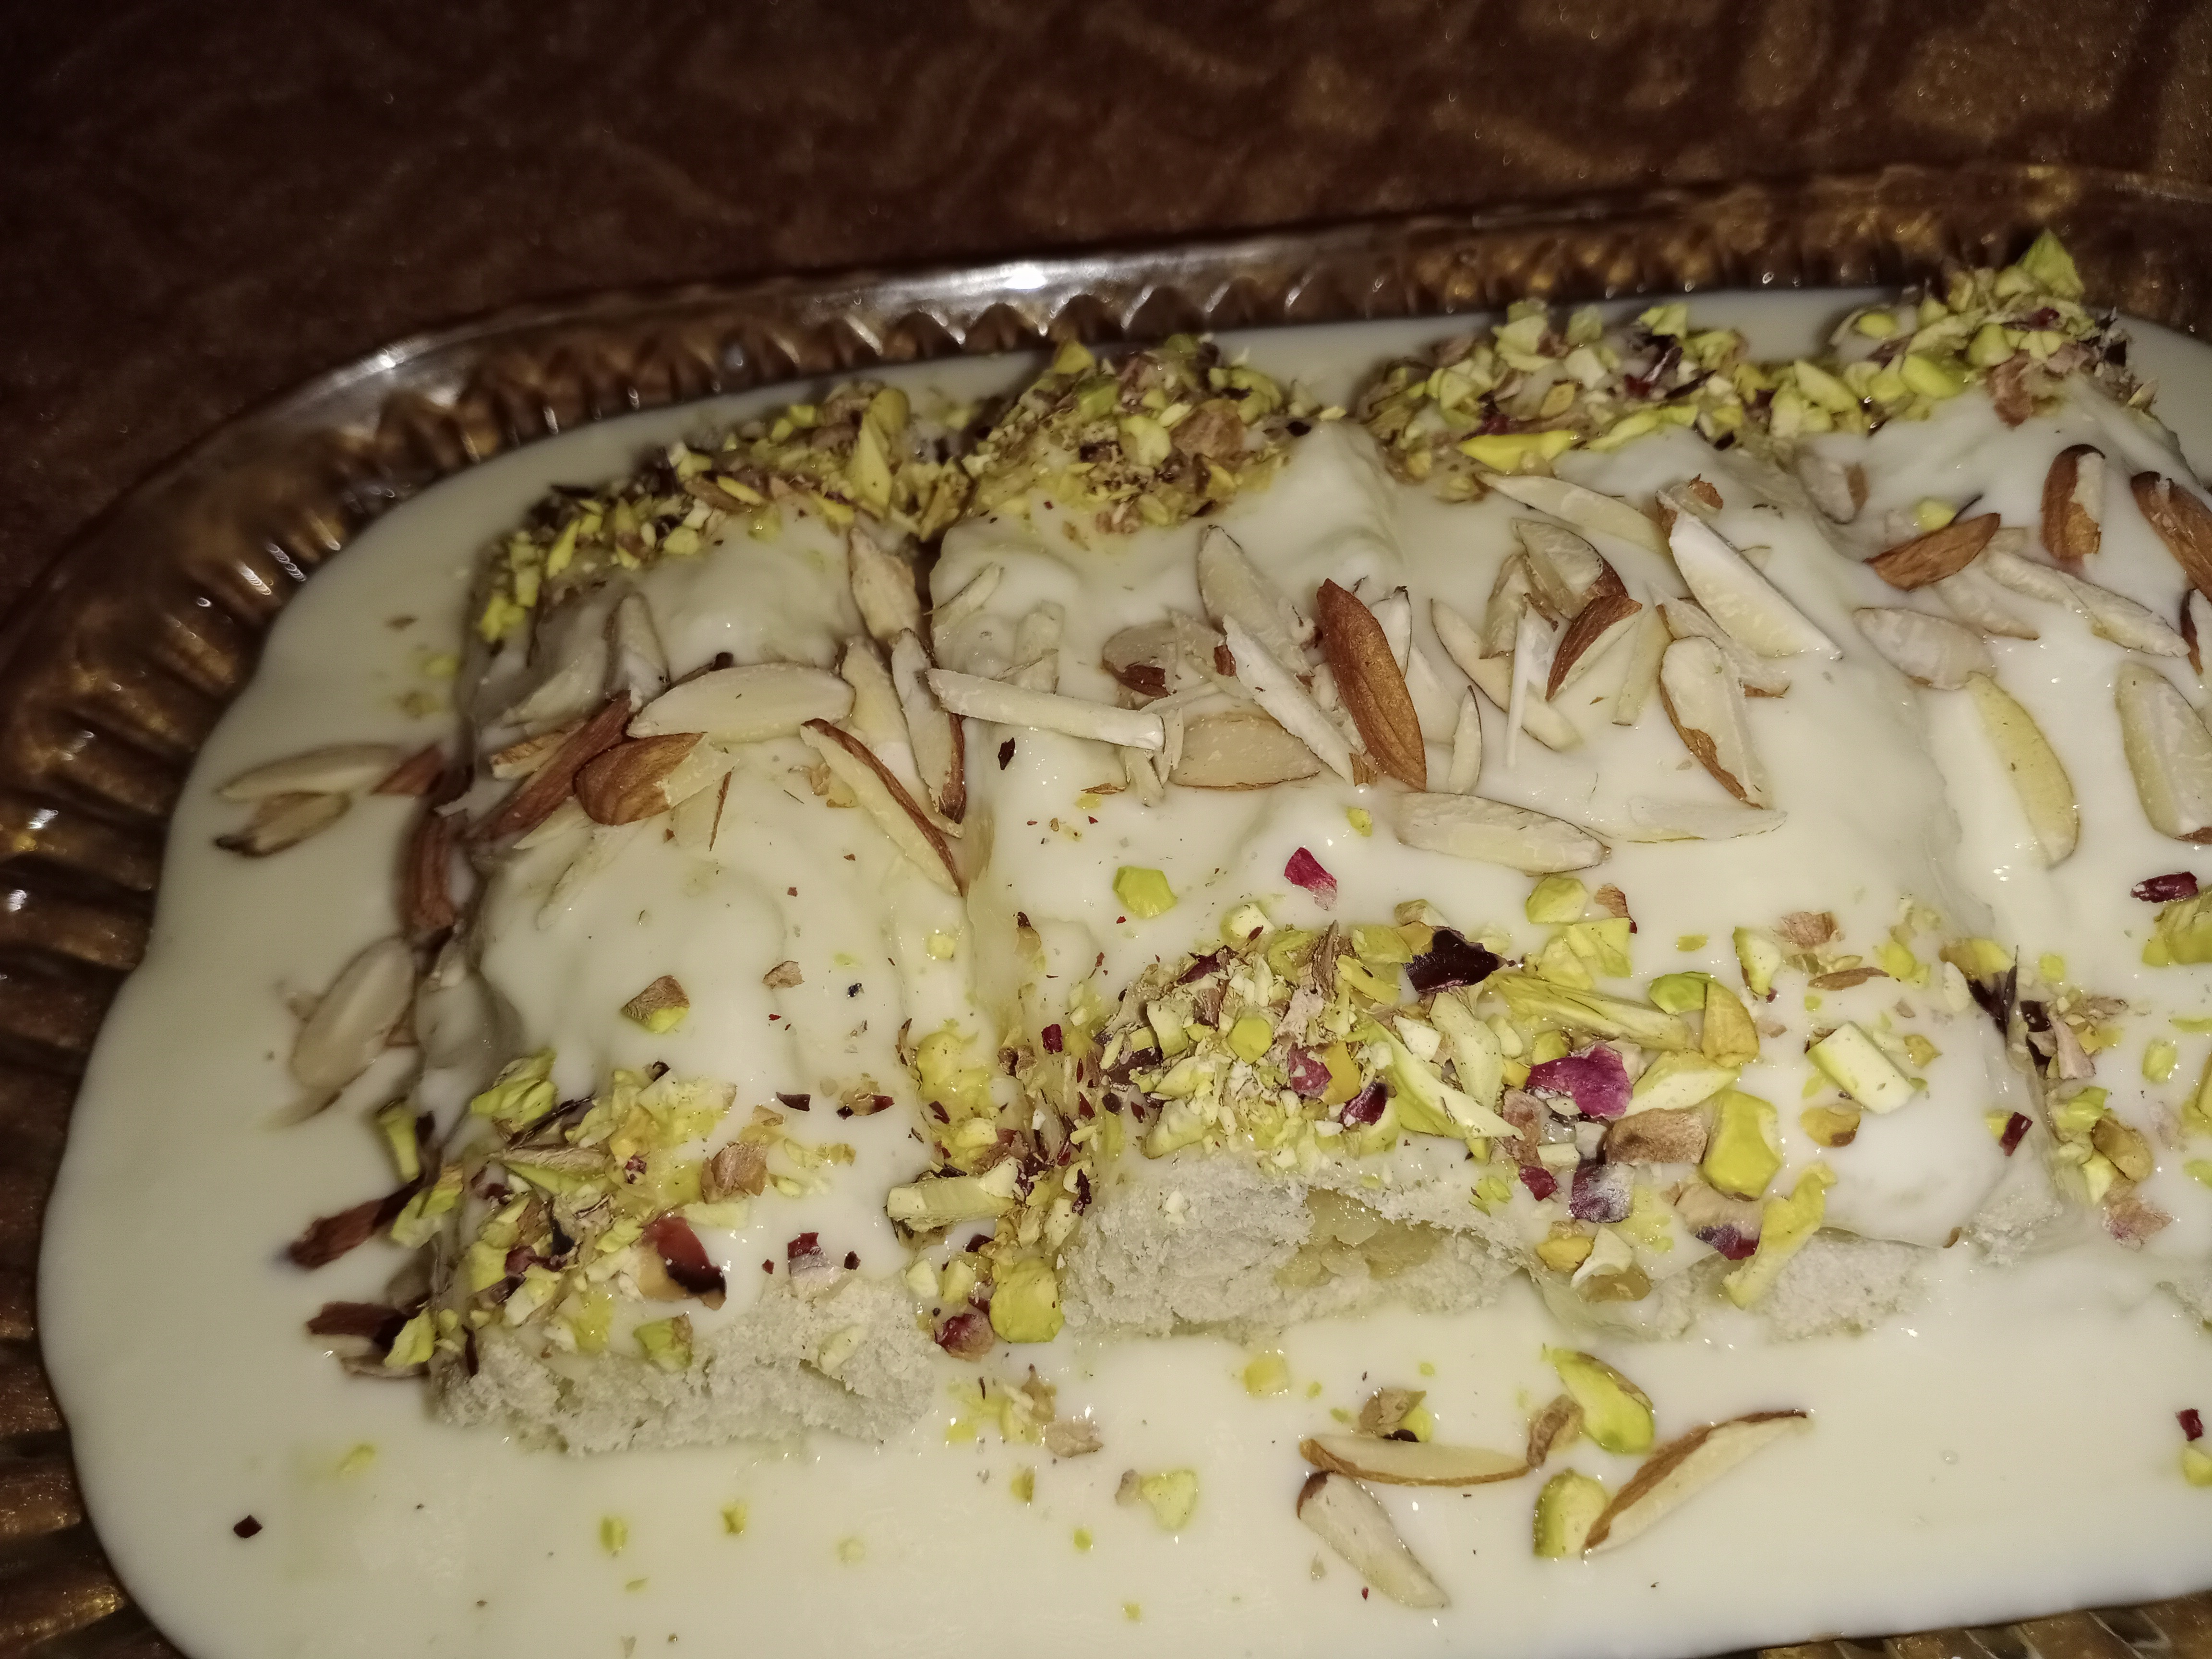 Bread Malai Roll Pakistani Food Recipe (With Video)